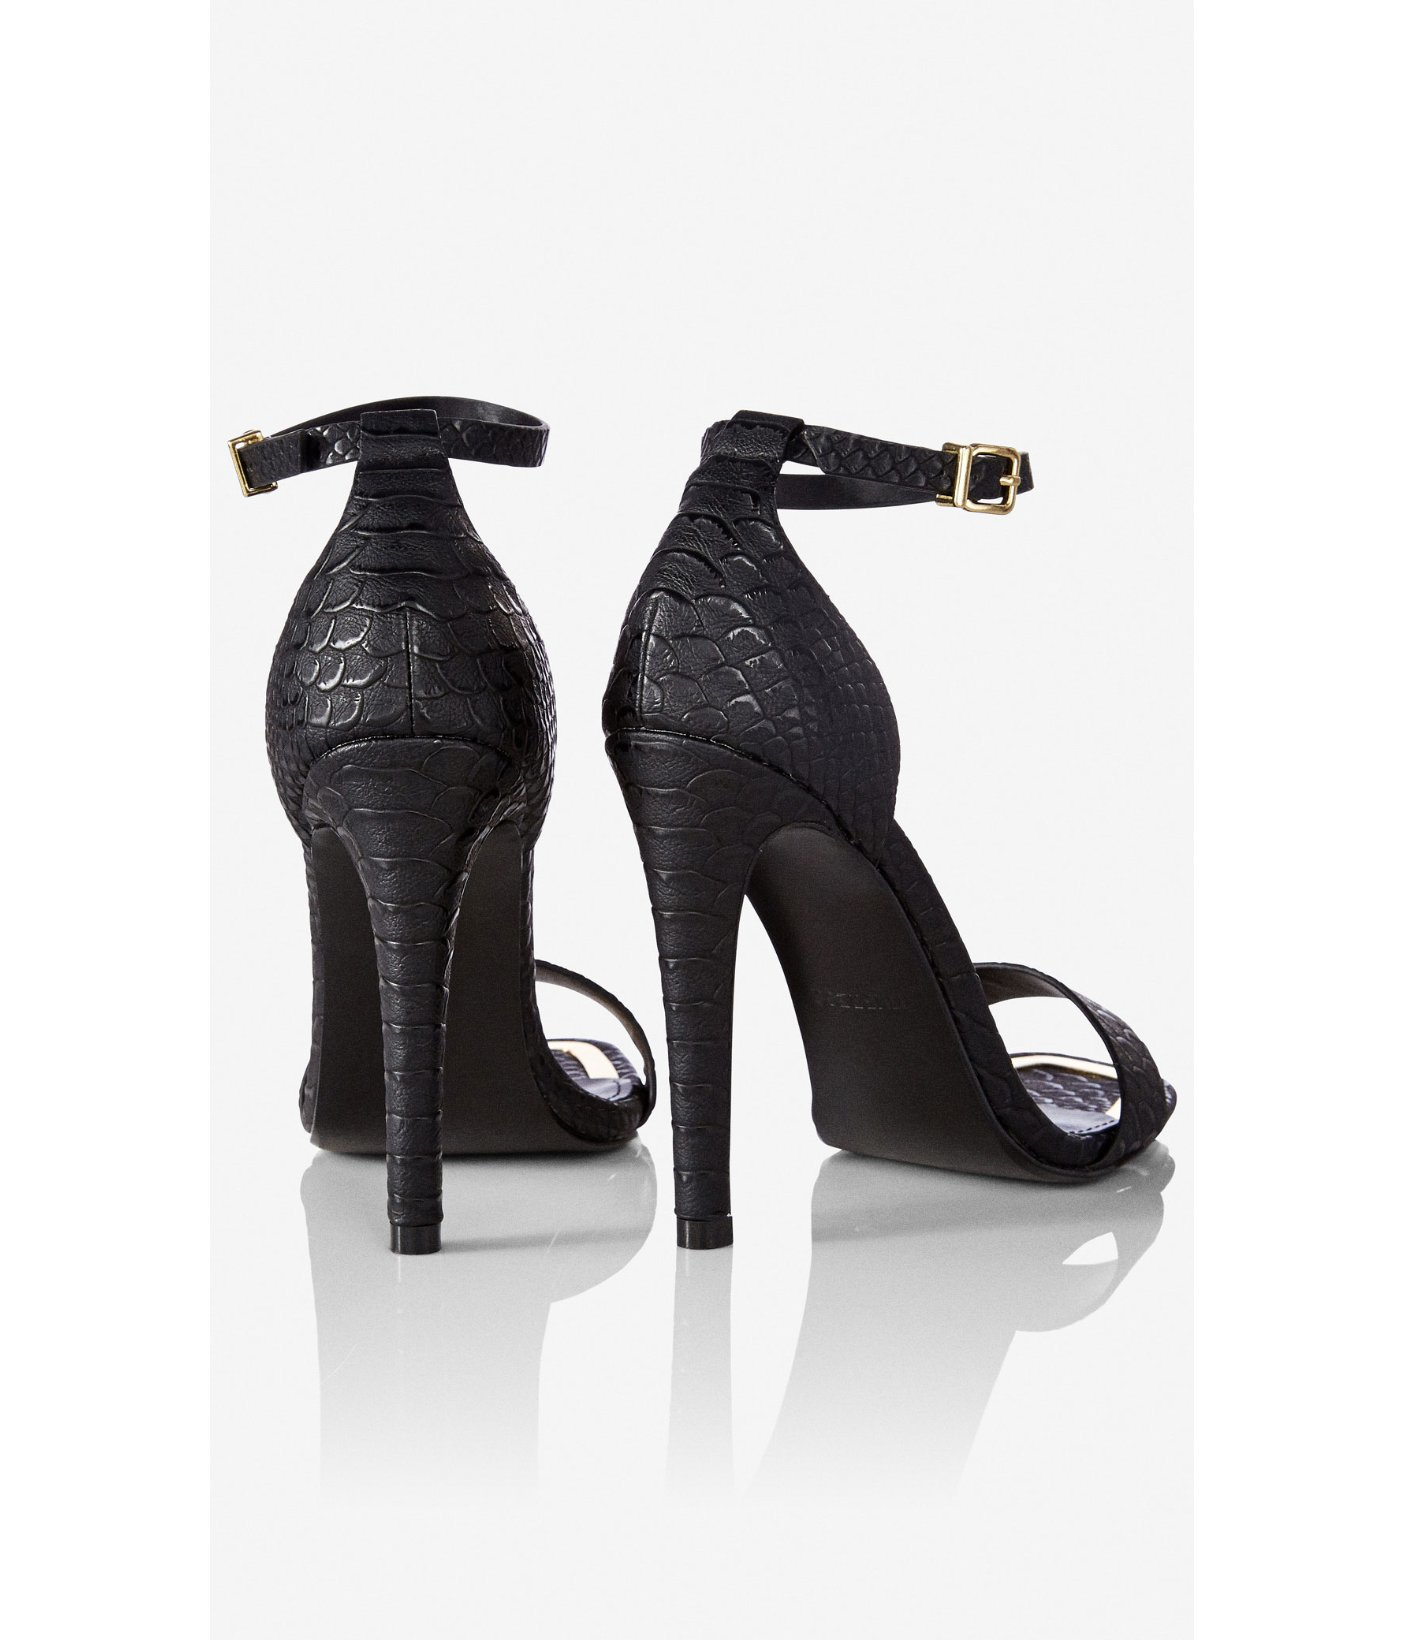 ebe5f579cbe2 Lyst - Express Square Toe Sleek Heeled Sandal in Black